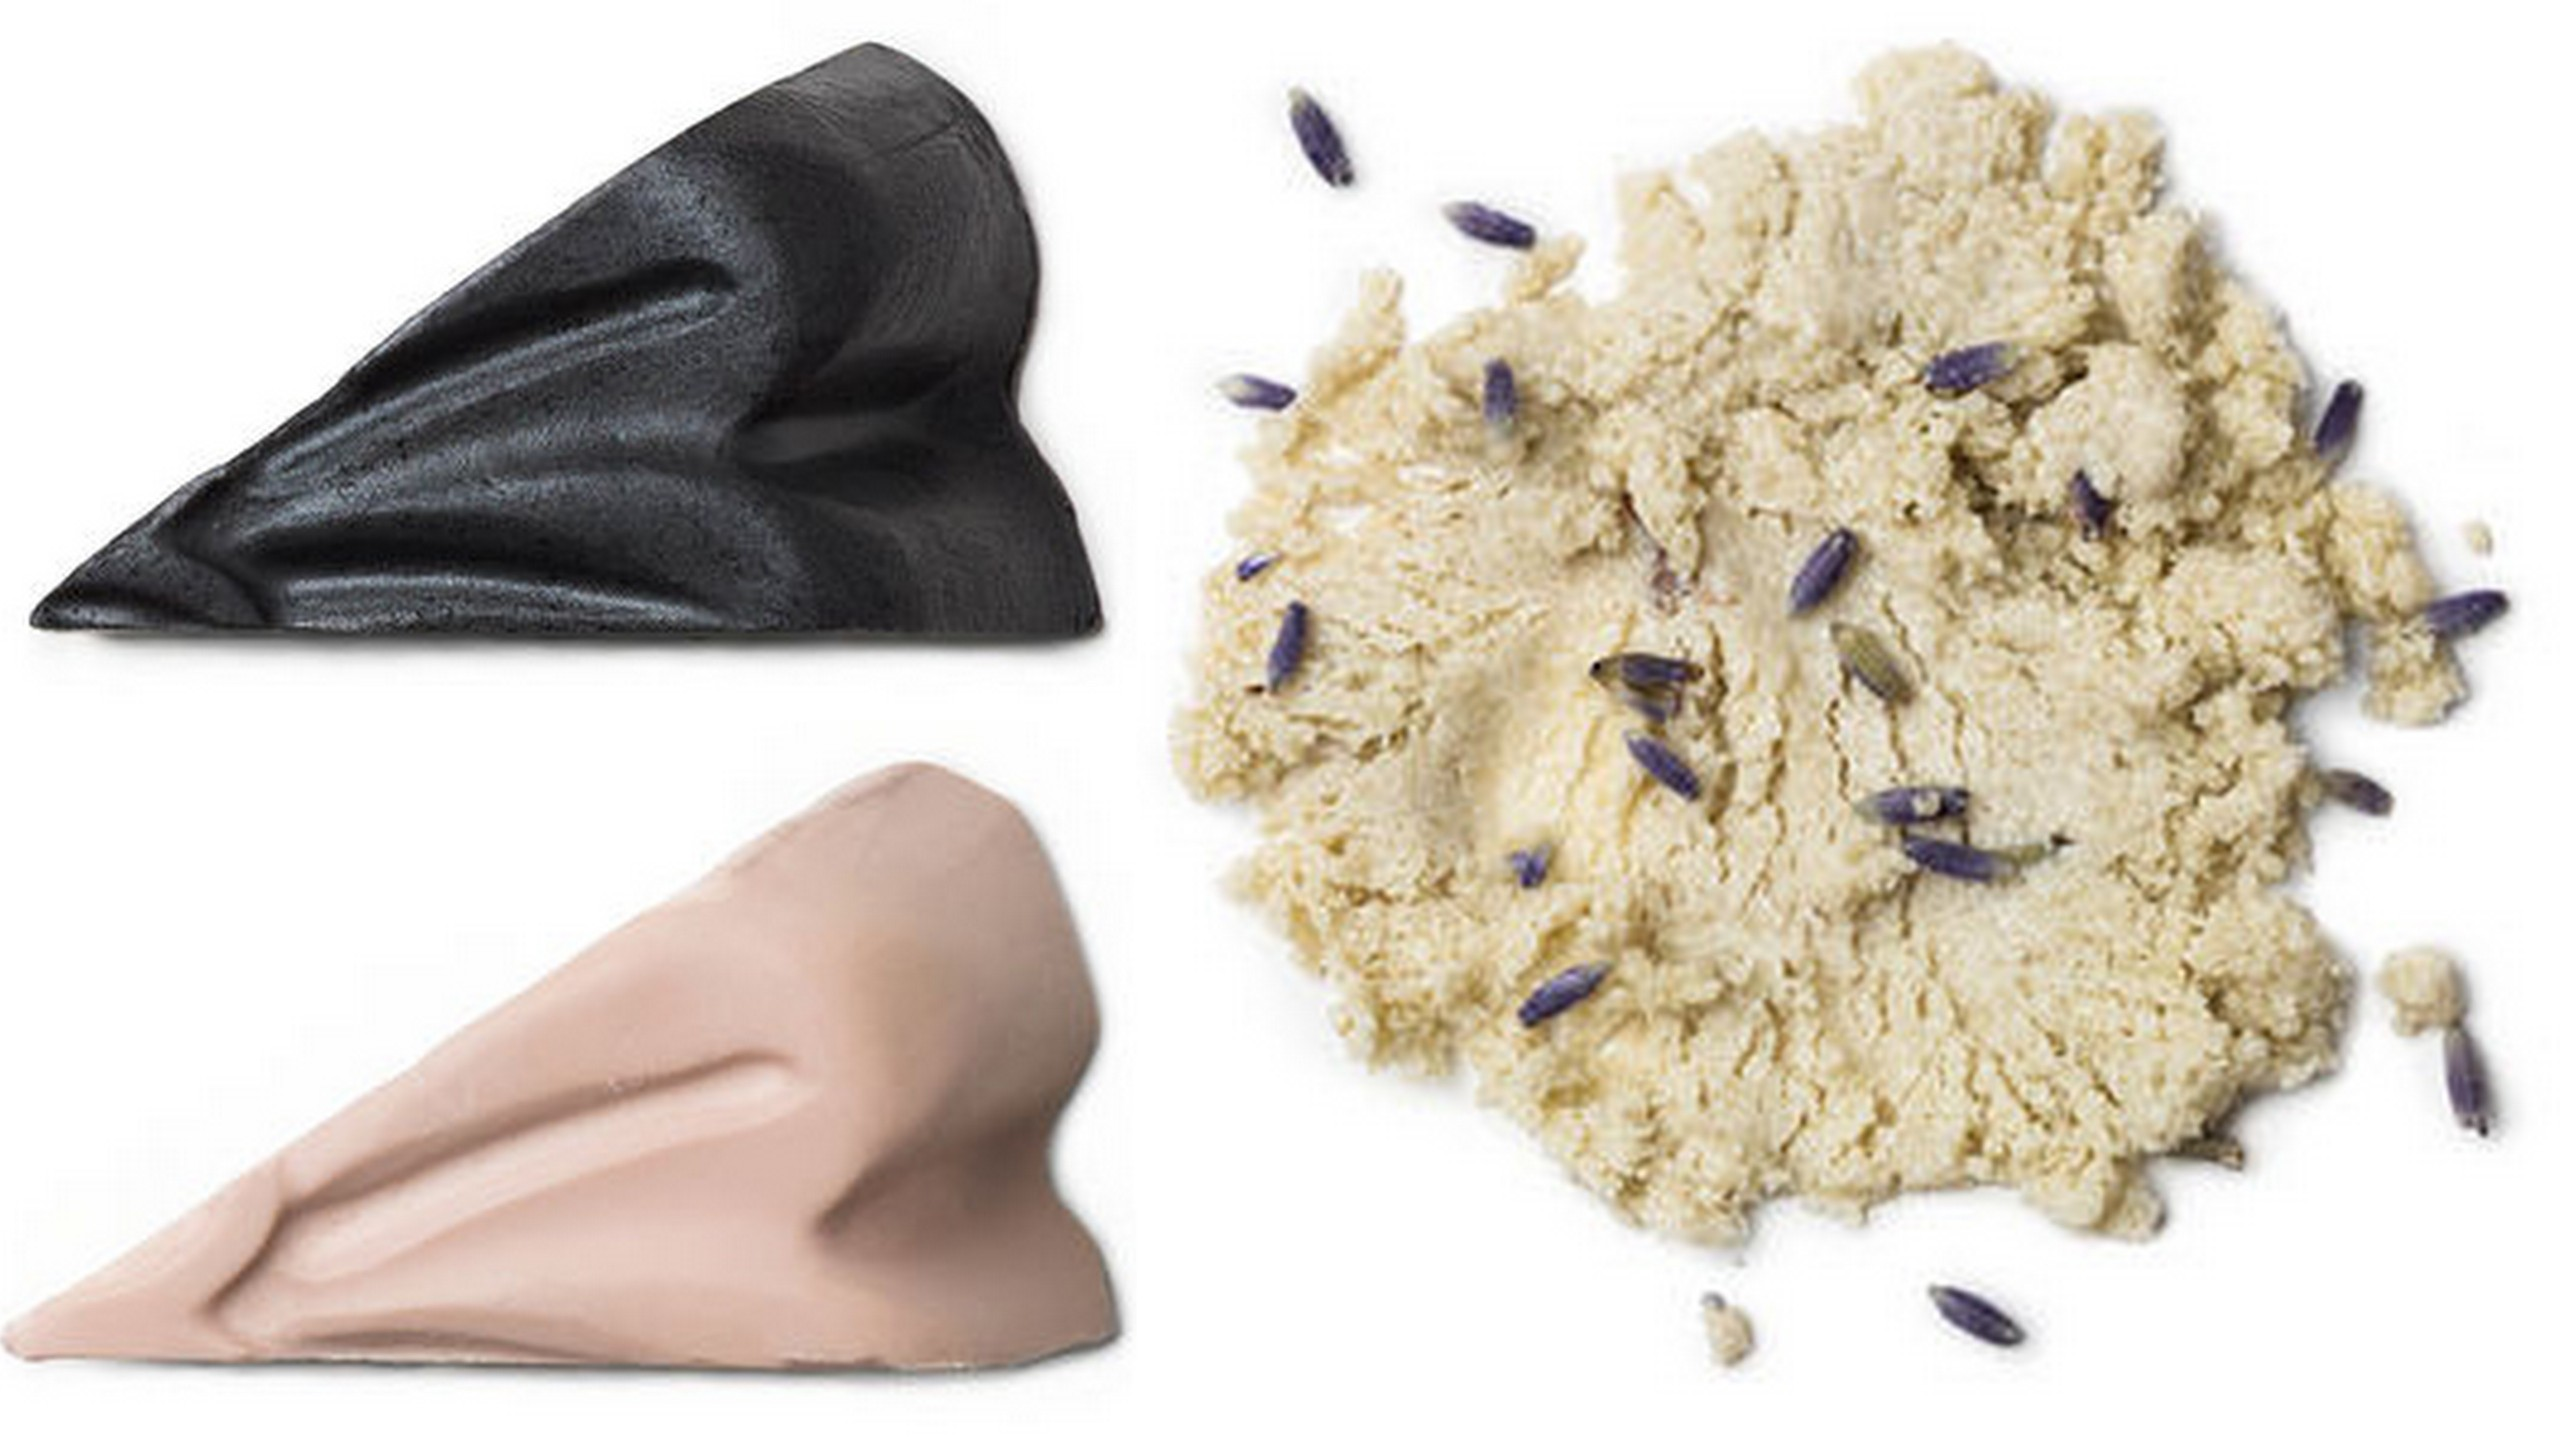 Lush Cosmetics Coalface, Fresh Farmacy and Angels On Bare Skin